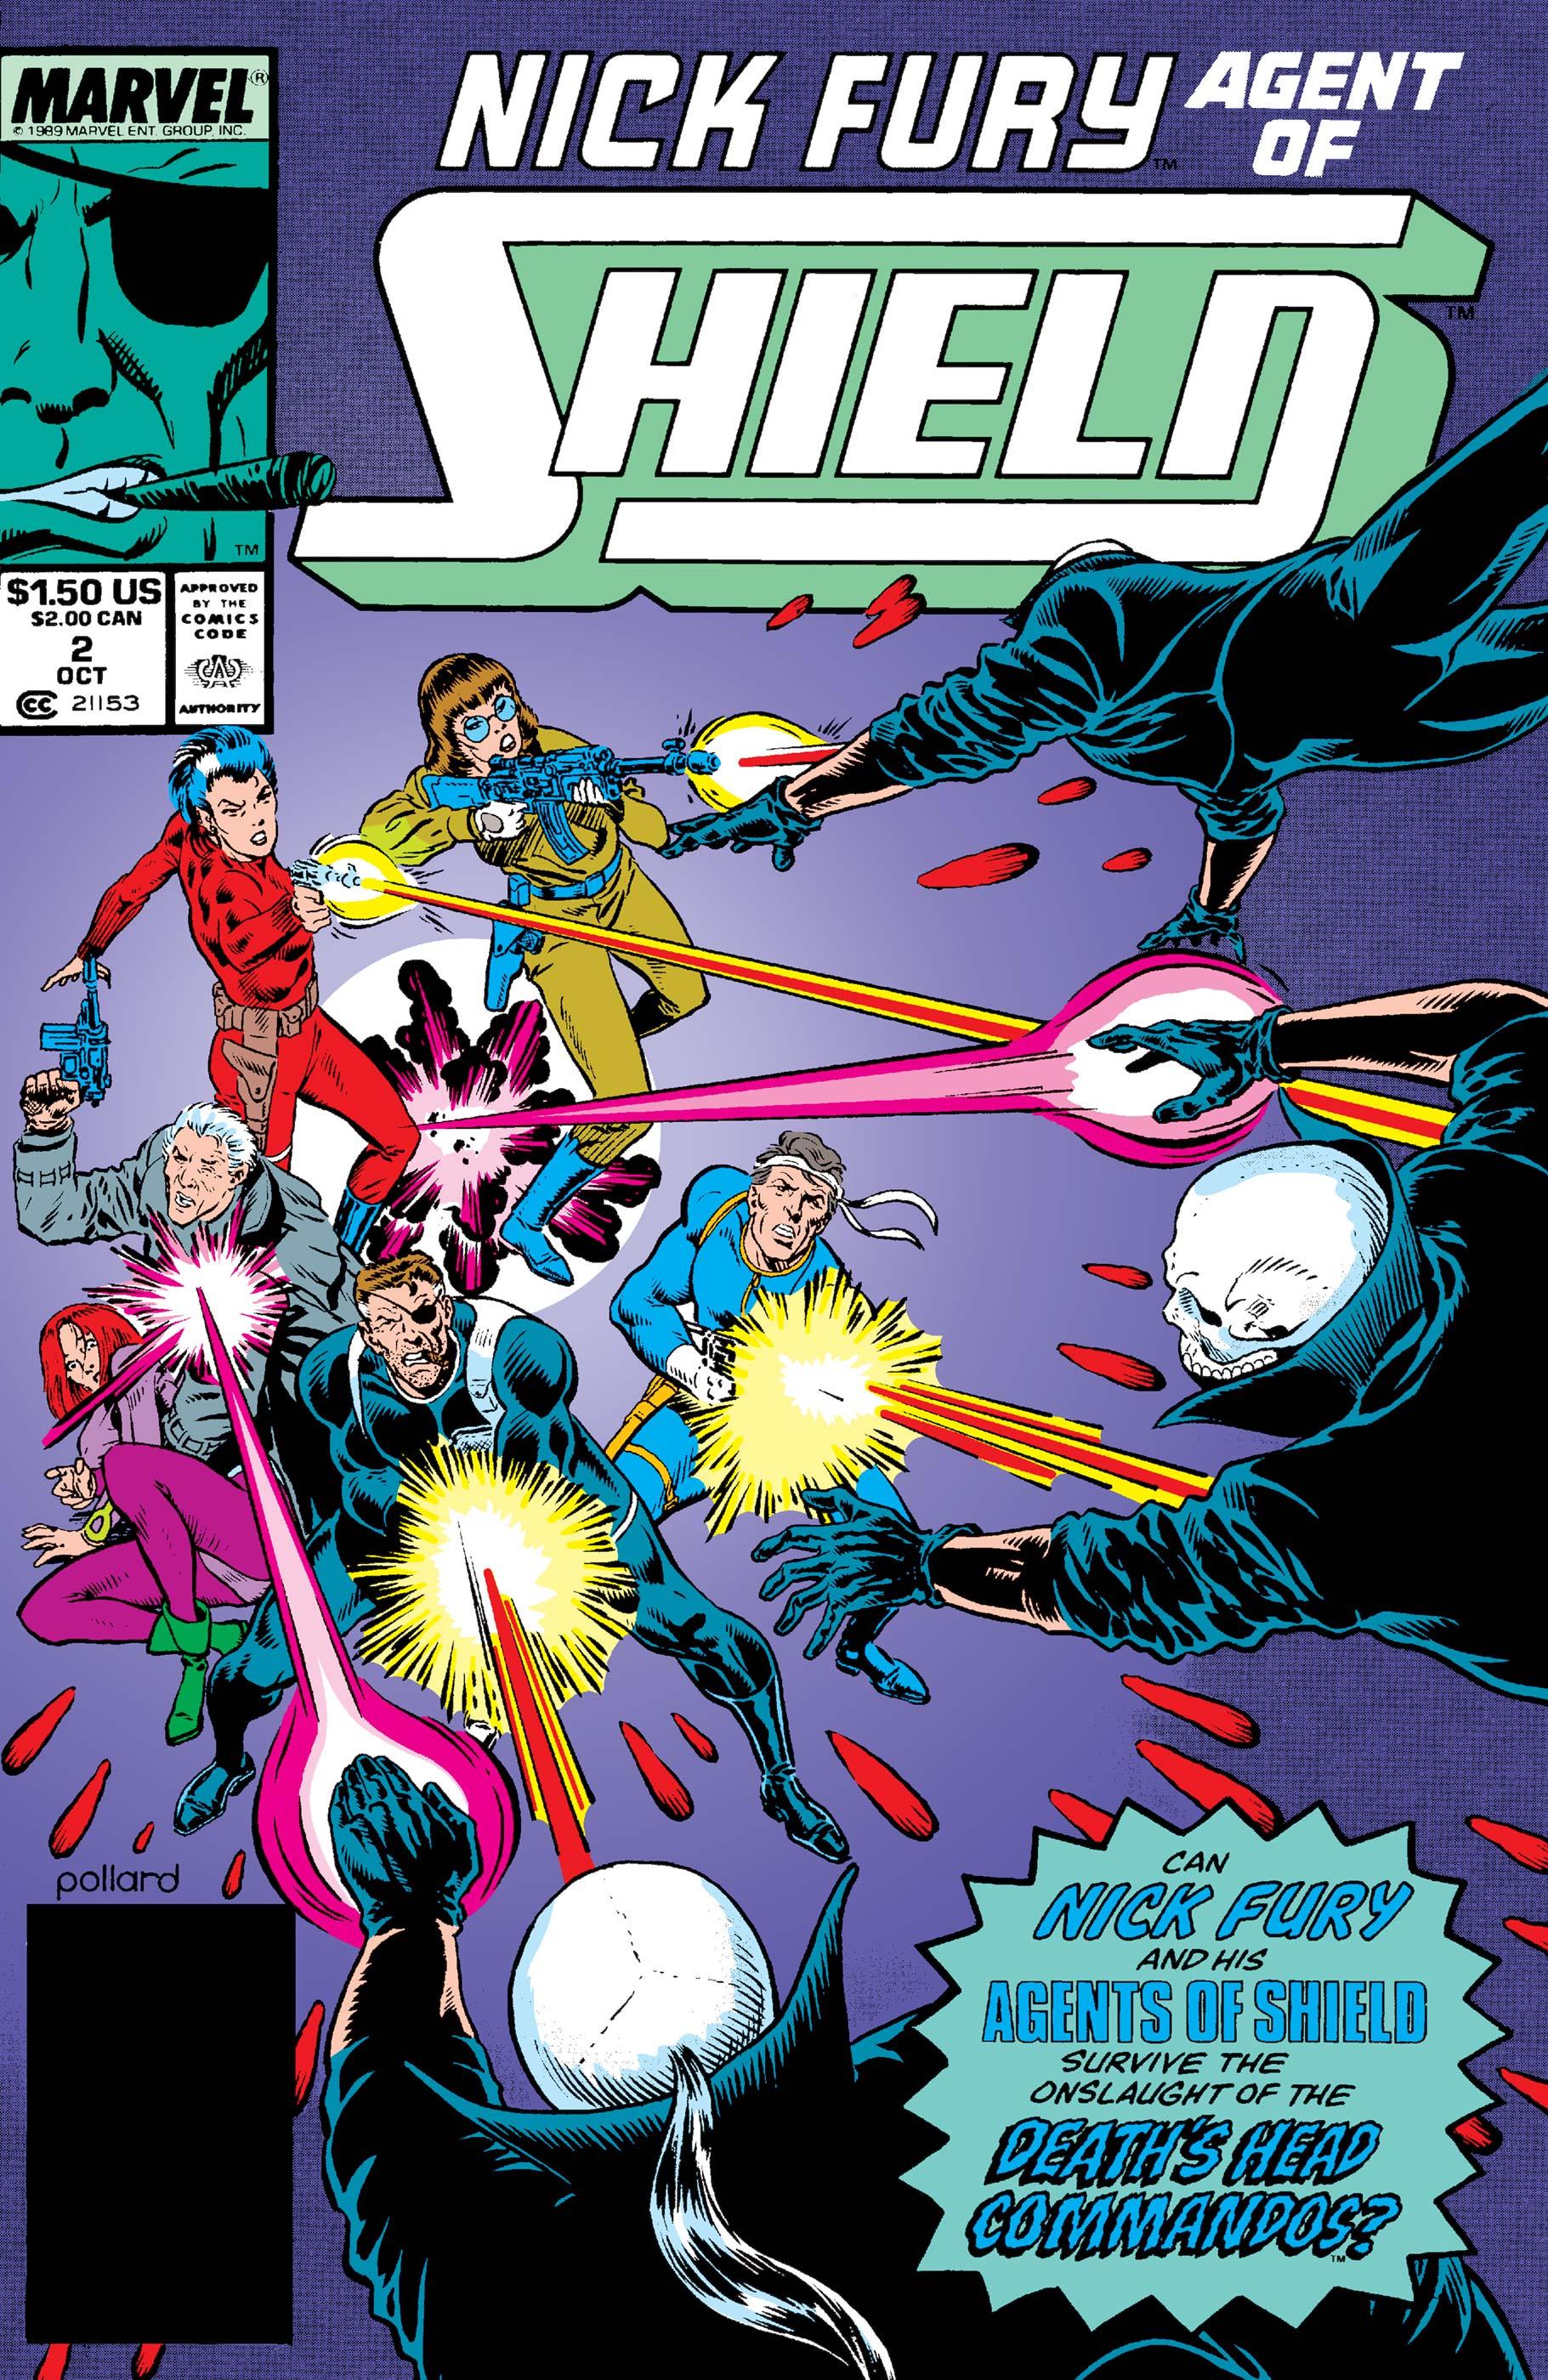 Nick Fury, Agent of S.H.I.E.L.D. (1989) #2